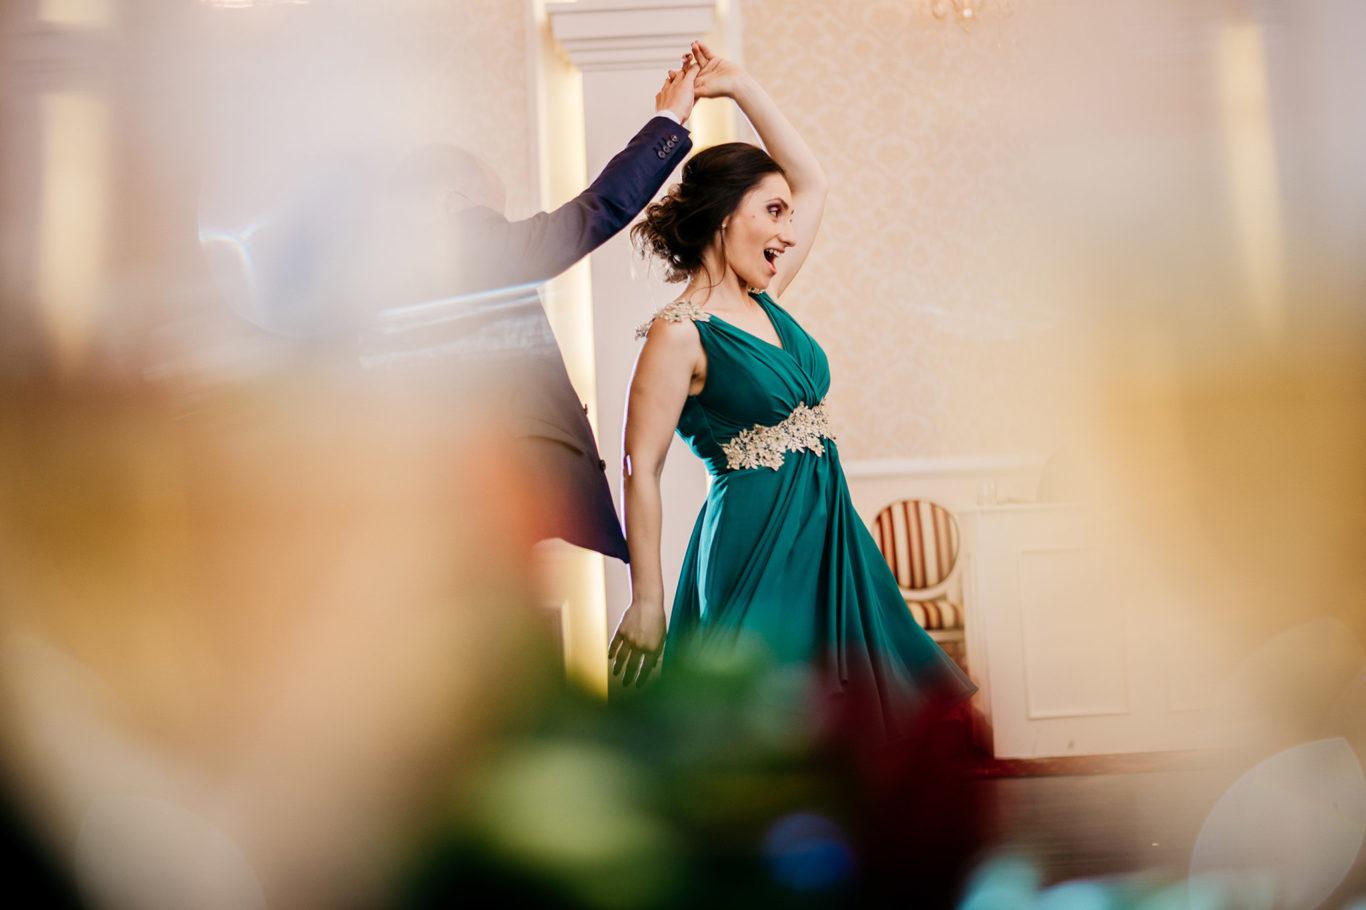 0674-fotografie-nunta-bucuresti-anca-george-fotograf-ciprian-dumitrescu-dsc_9516